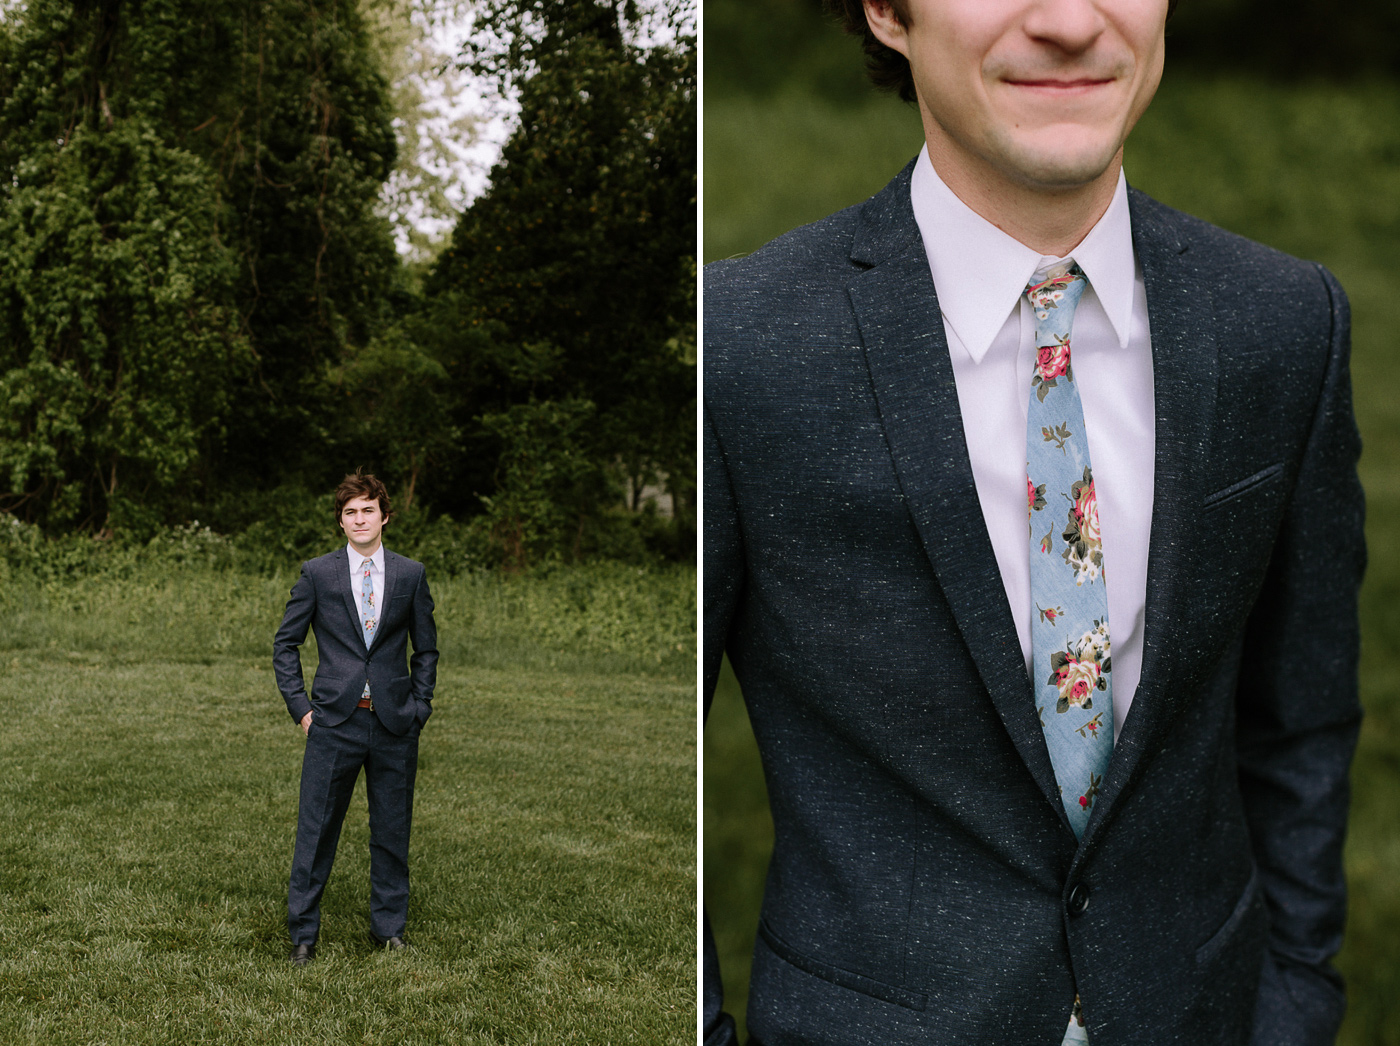 Groom Portraits Outdoors